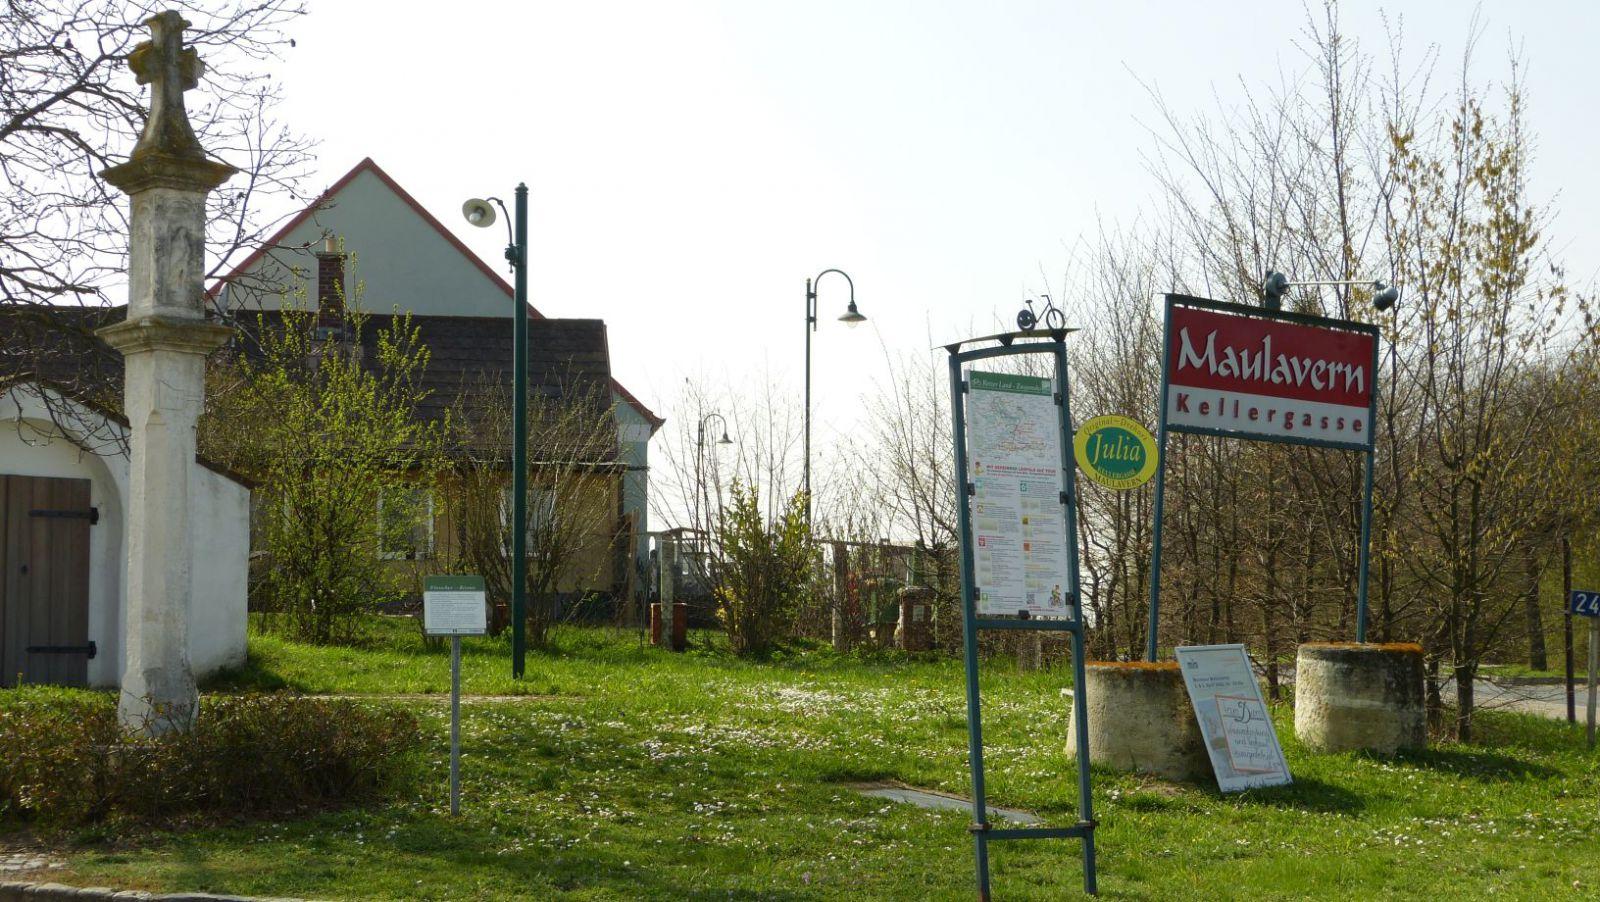 Zellerndorf - Maulavern